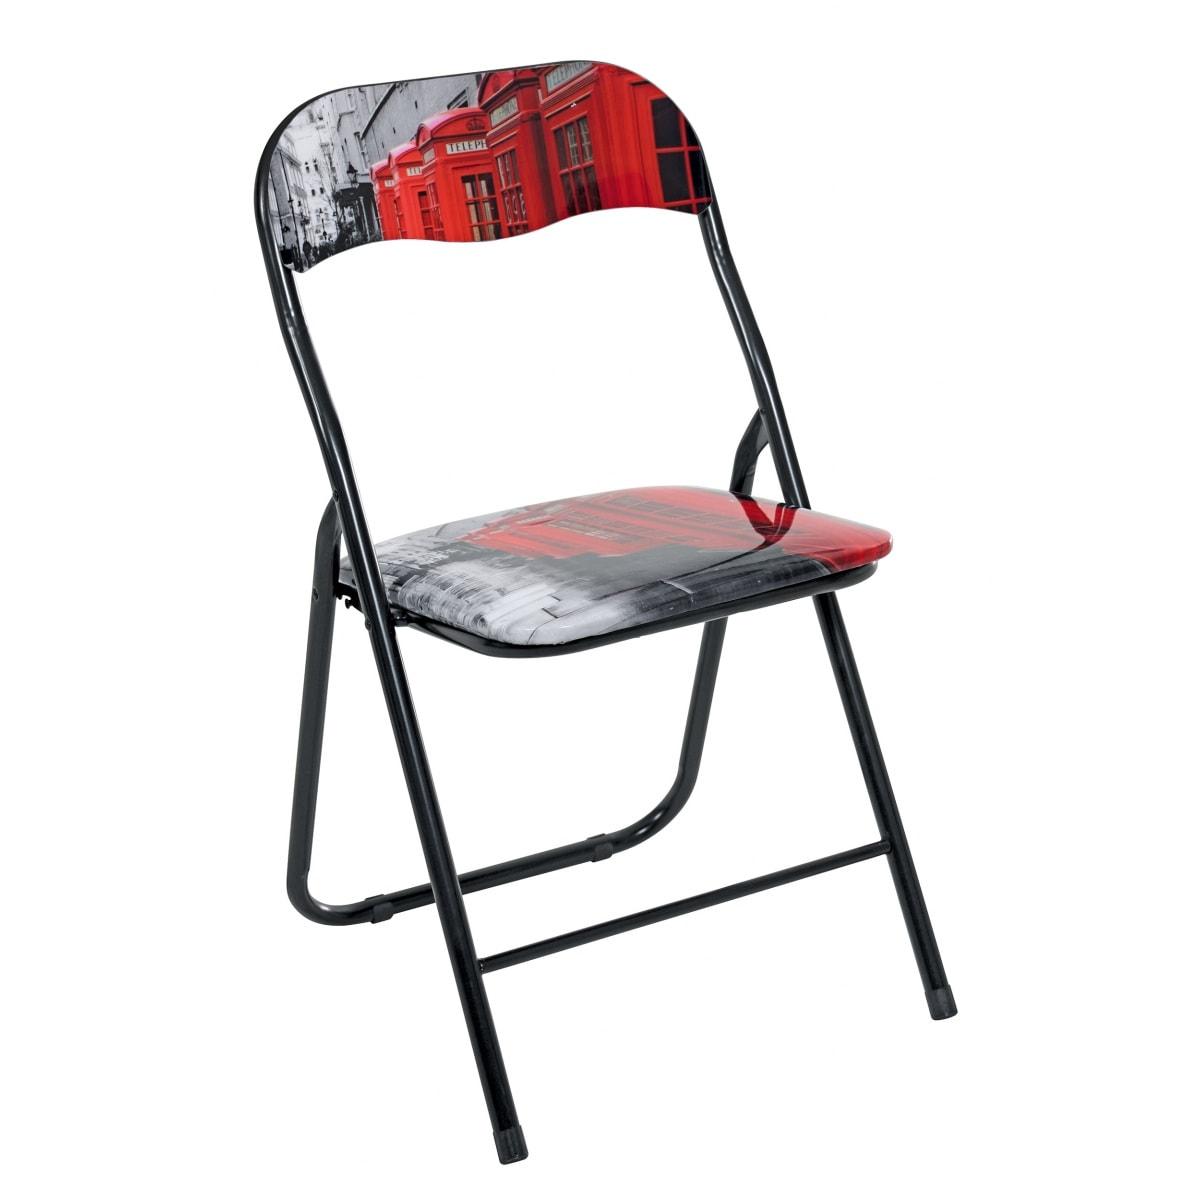 klappstuhl mit motiv st hle esszimmer wohnen m bel boss. Black Bedroom Furniture Sets. Home Design Ideas